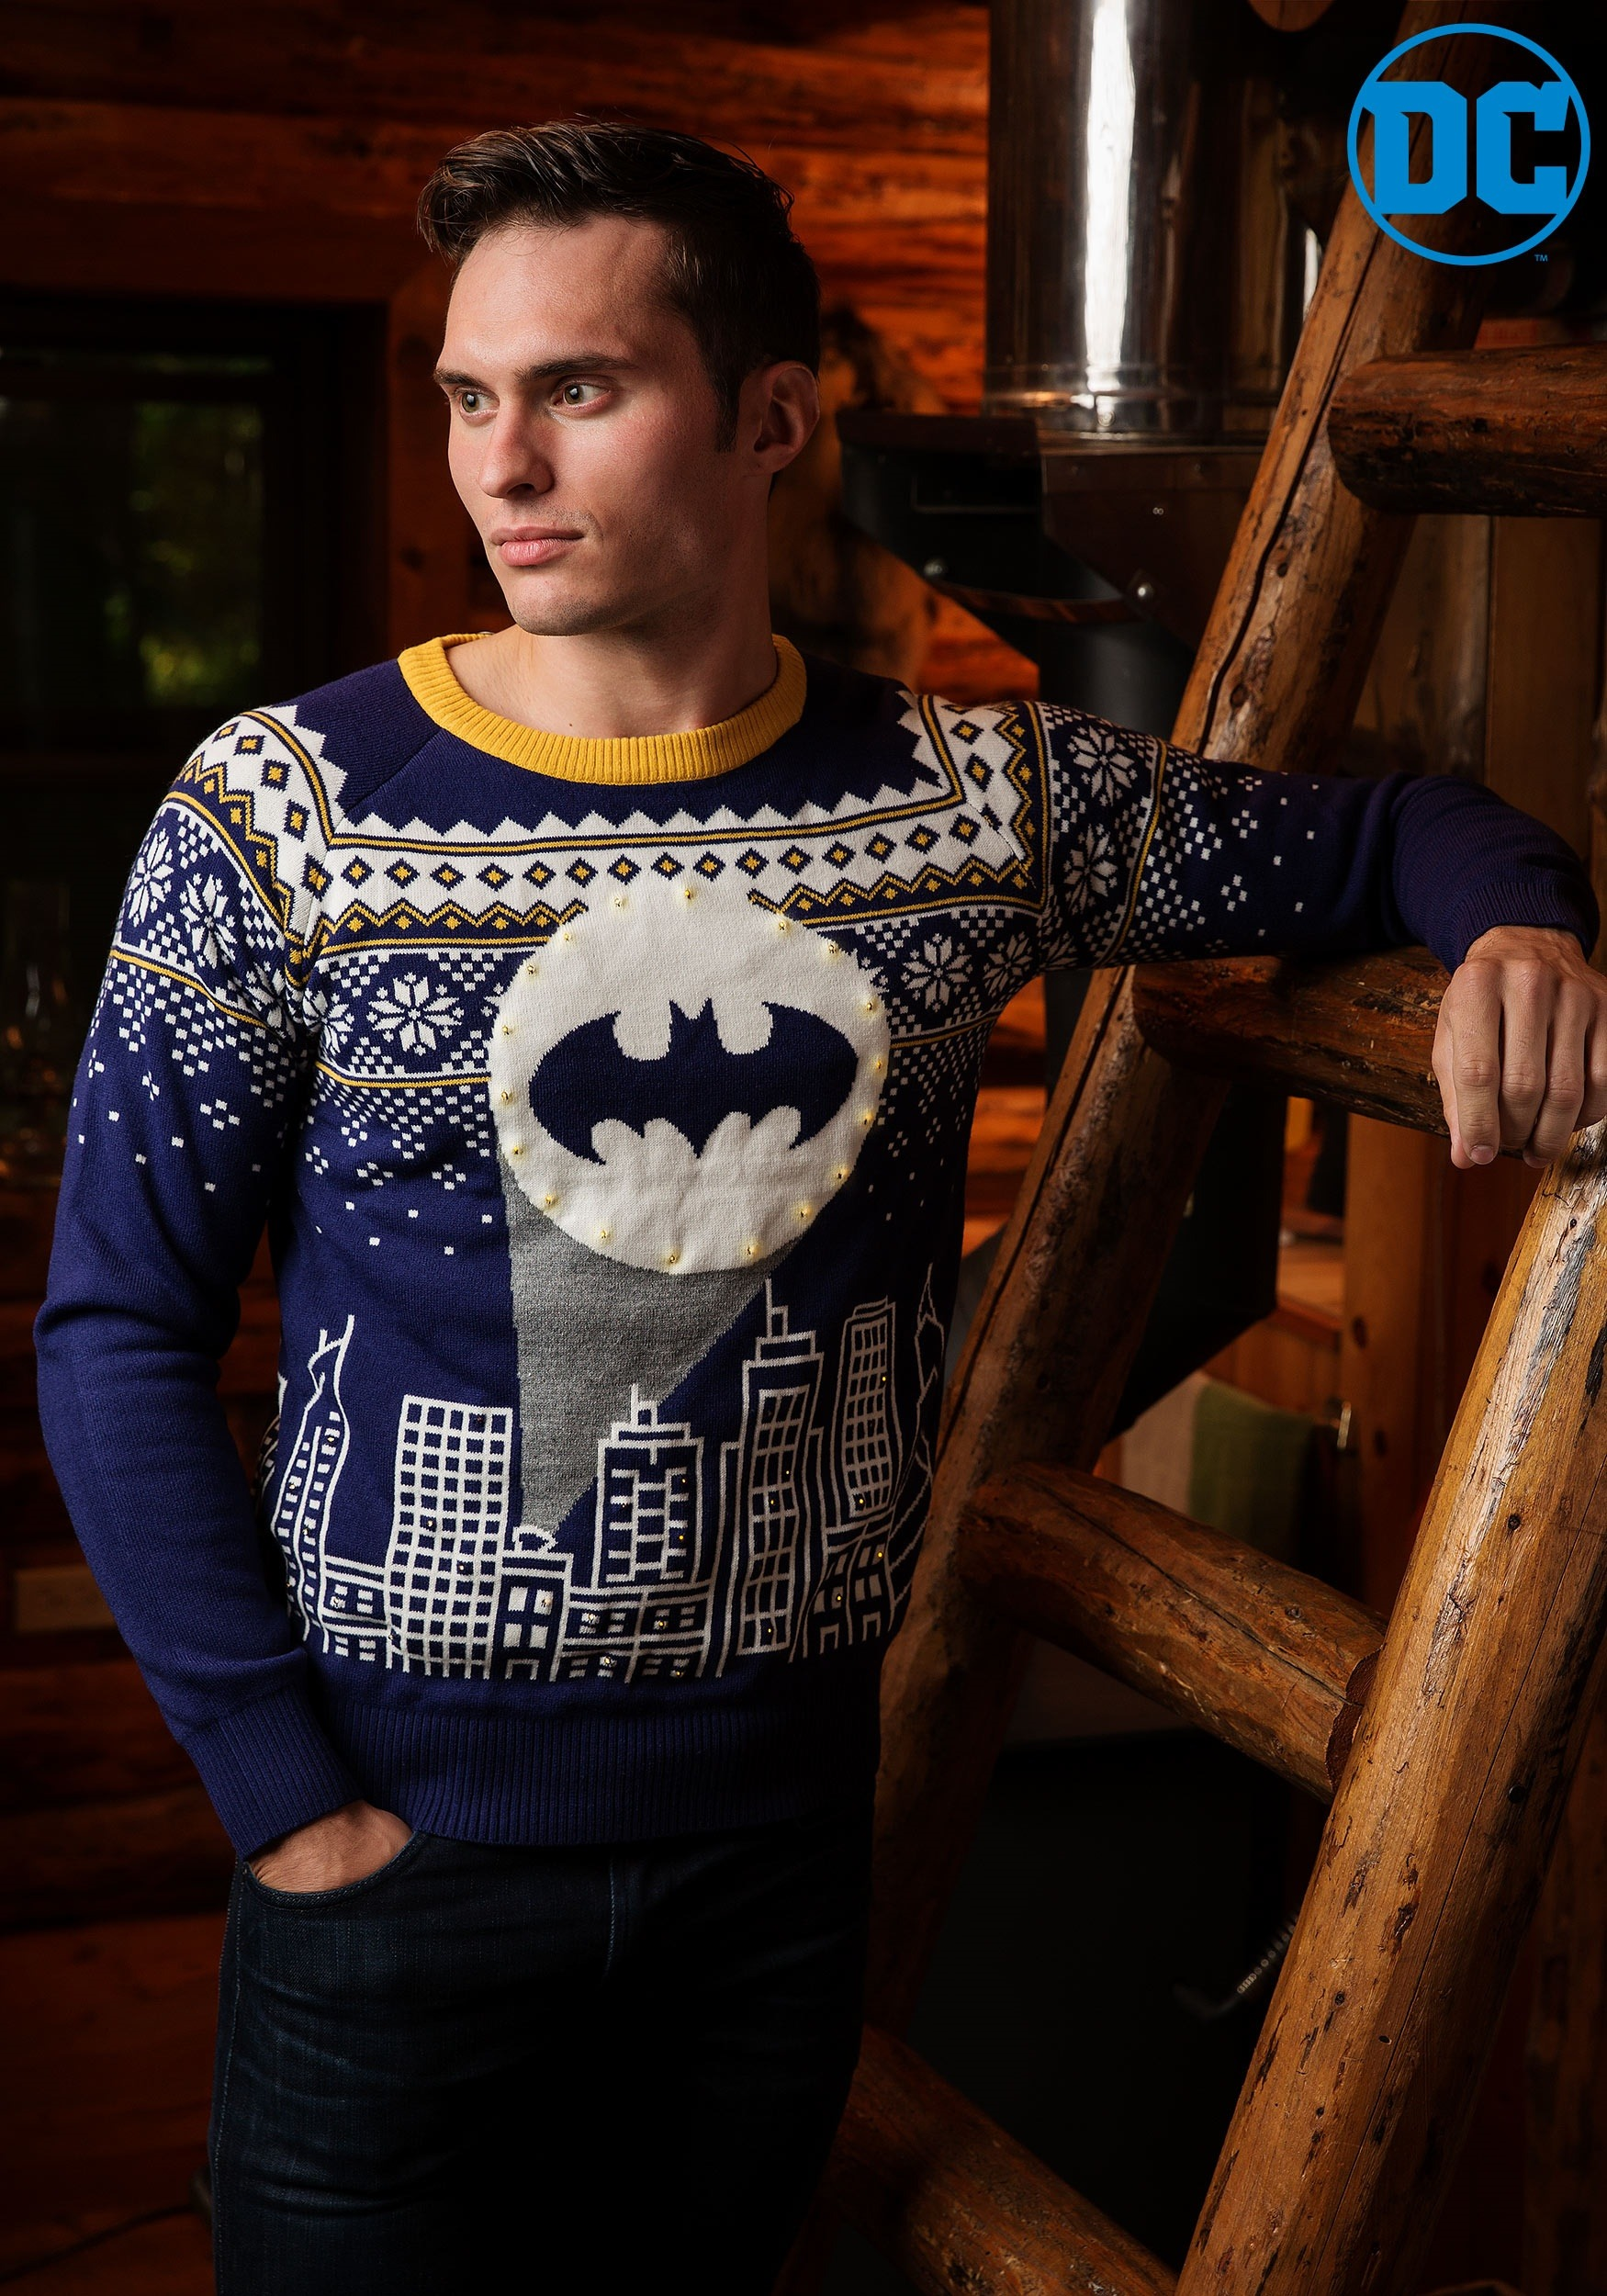 Mens 3x Ugly Christmas Sweater.Batman Bat Signal Ugly Christmas Sweater